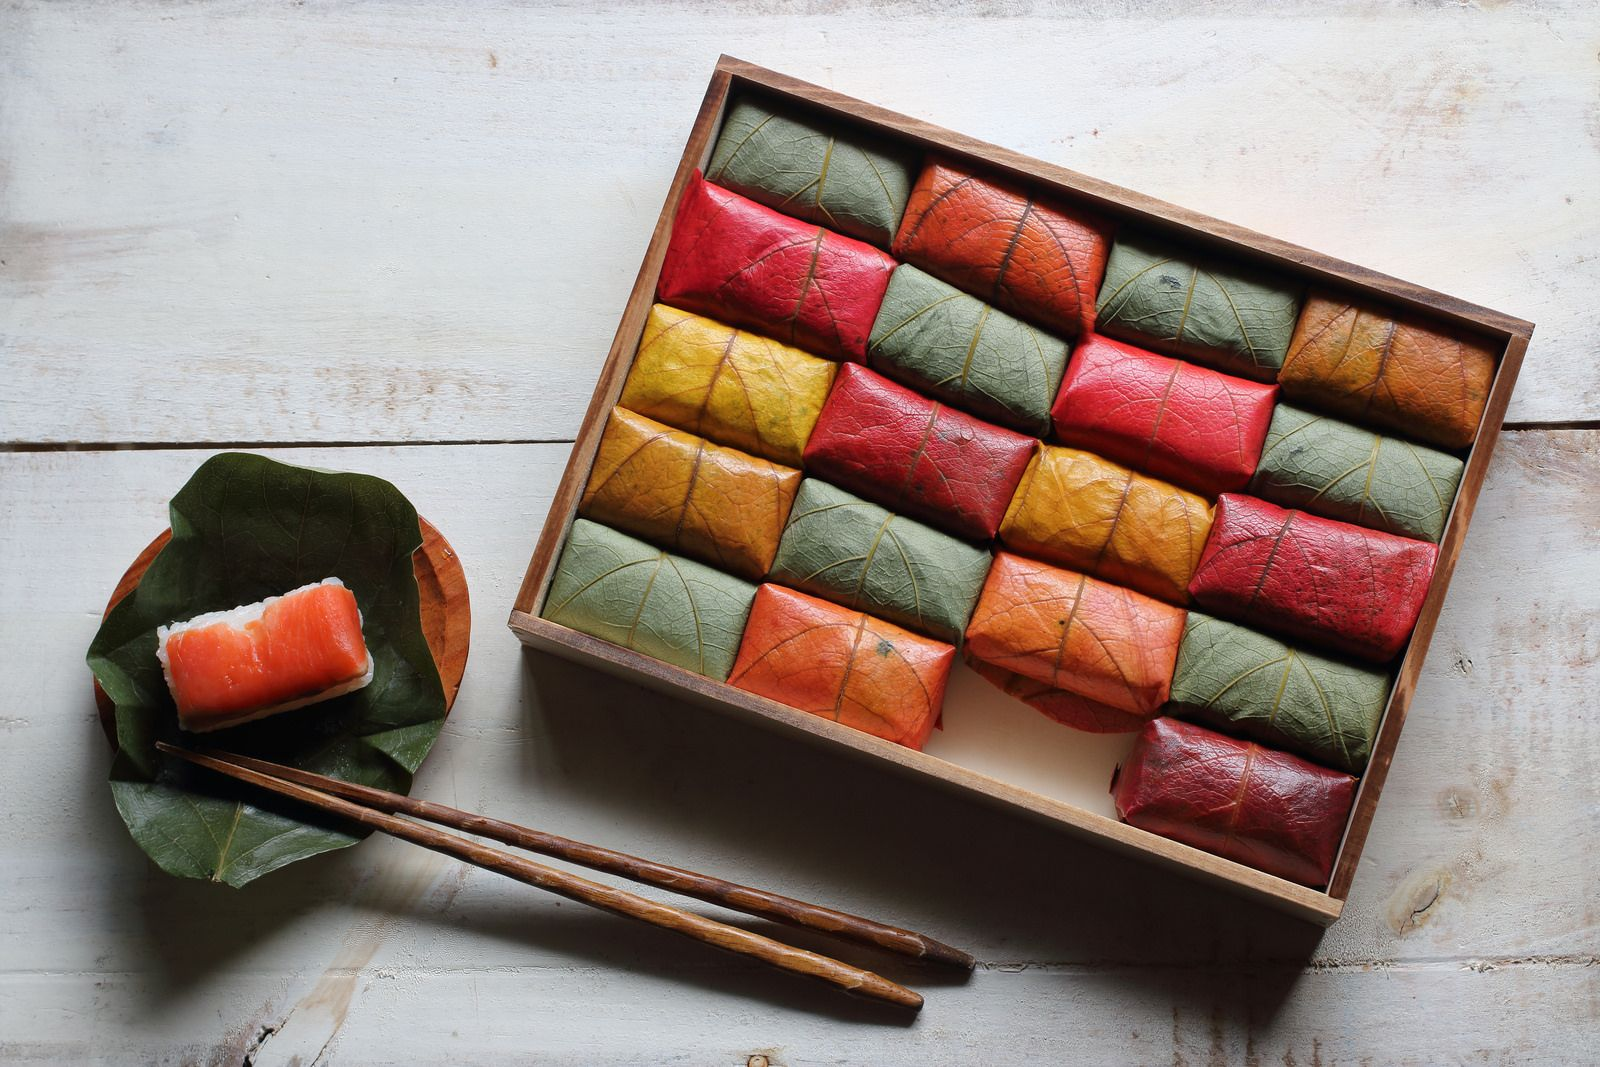 طبق كاكين أوهازوشي وهو طبق سوشي تقليدي خاصة بمحافظة توتوري